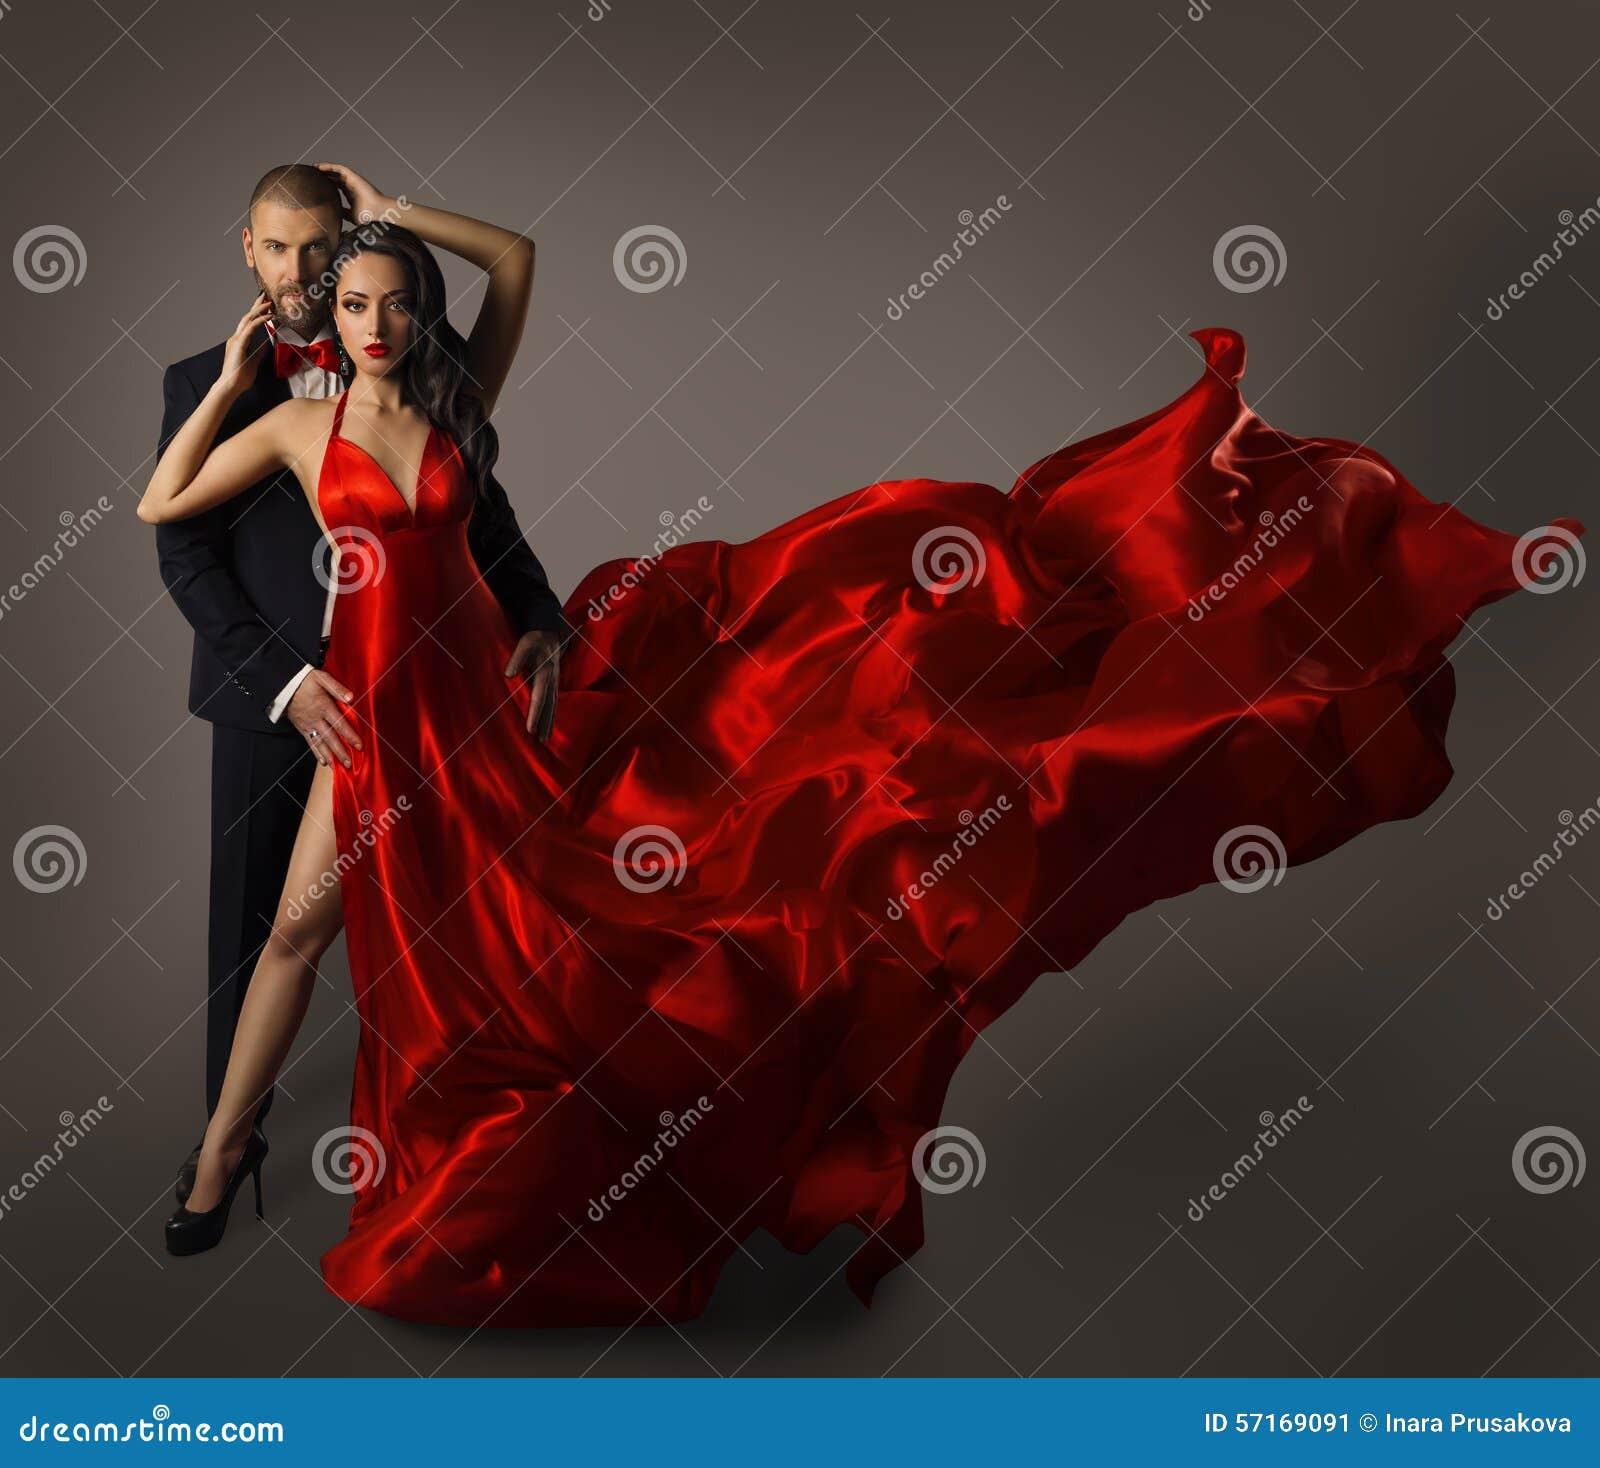 Fashion Couple Portrait, Woman Red Dress, Man in Suit, Long Cloth